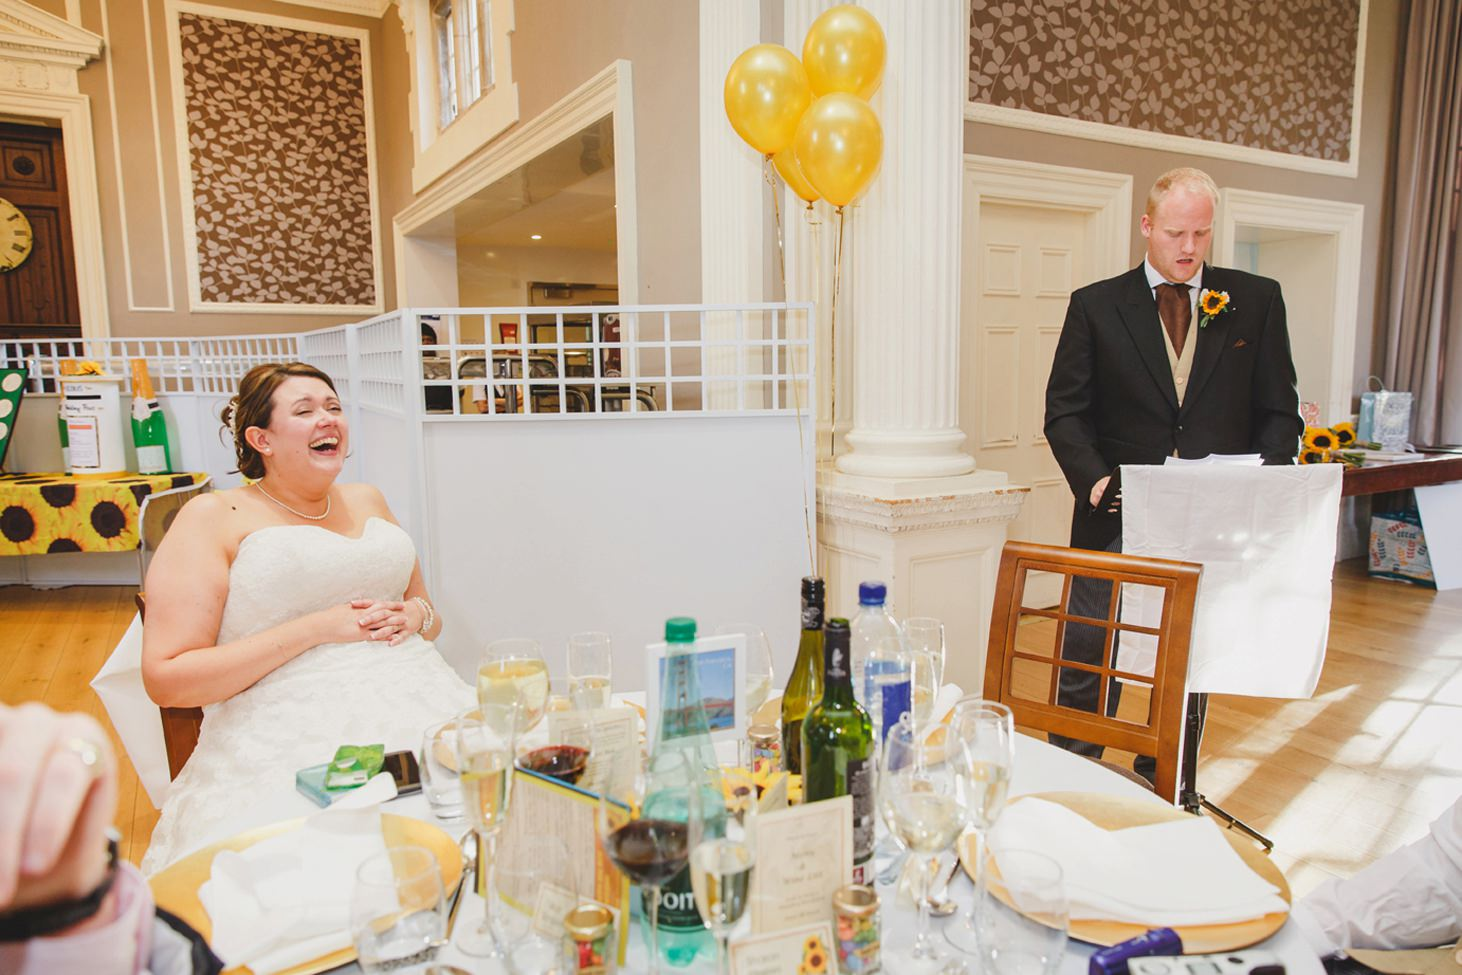 Wycombe Abbey wedding photography groom's speech to bride